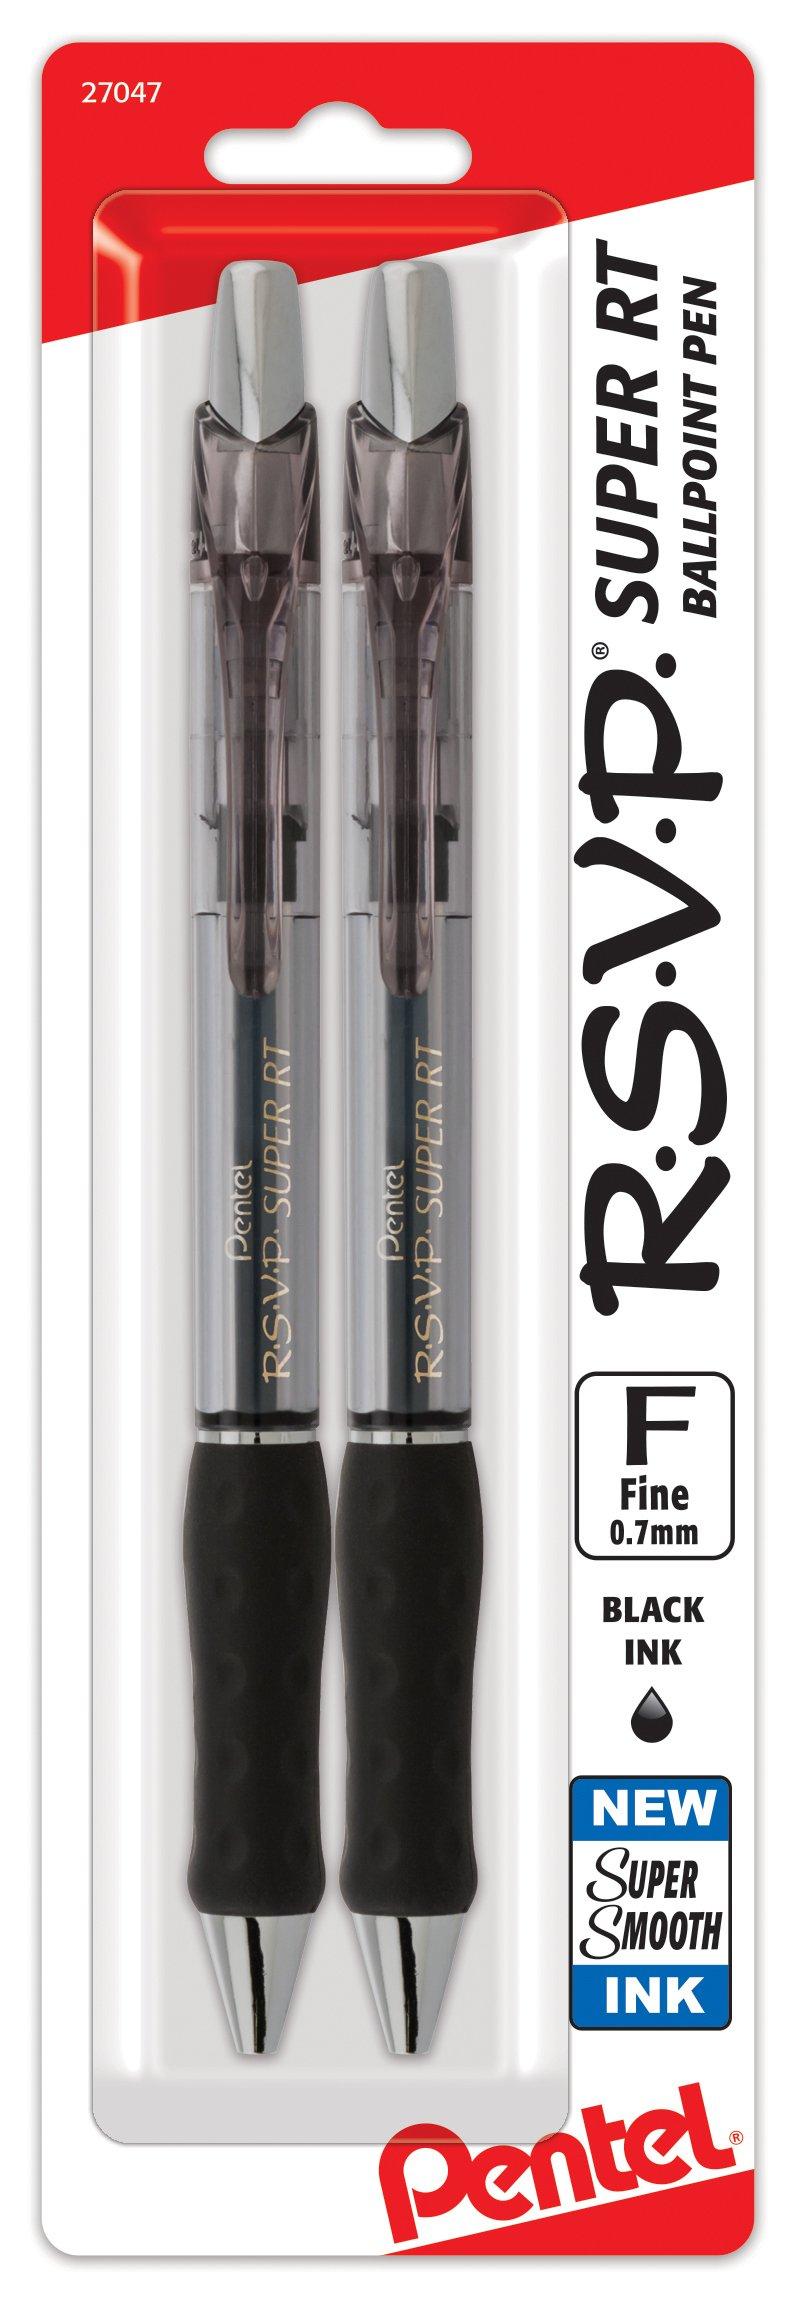 Pentel RSVP Super RT Ballpoint Pen, (0.7mm) Fine Line, Black Ink, 2-Pk - BX477BP2A